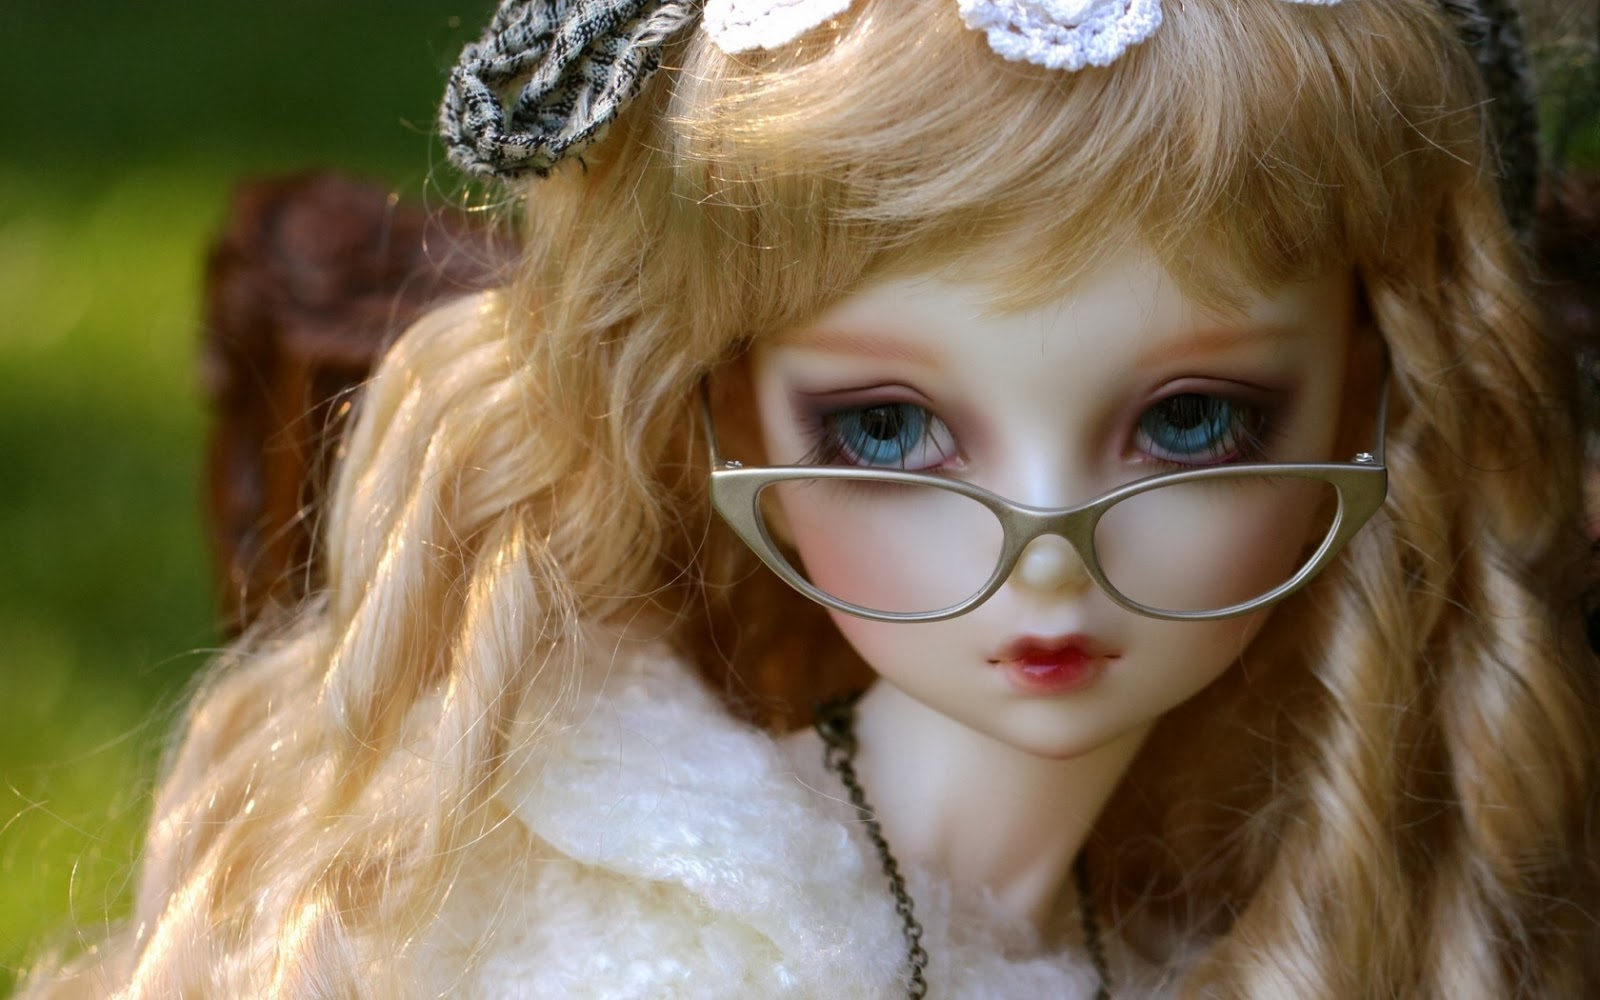 Pretty Barbie Dolls Wallpapers   beautiful desktop wallpapers 2014 1600x1000